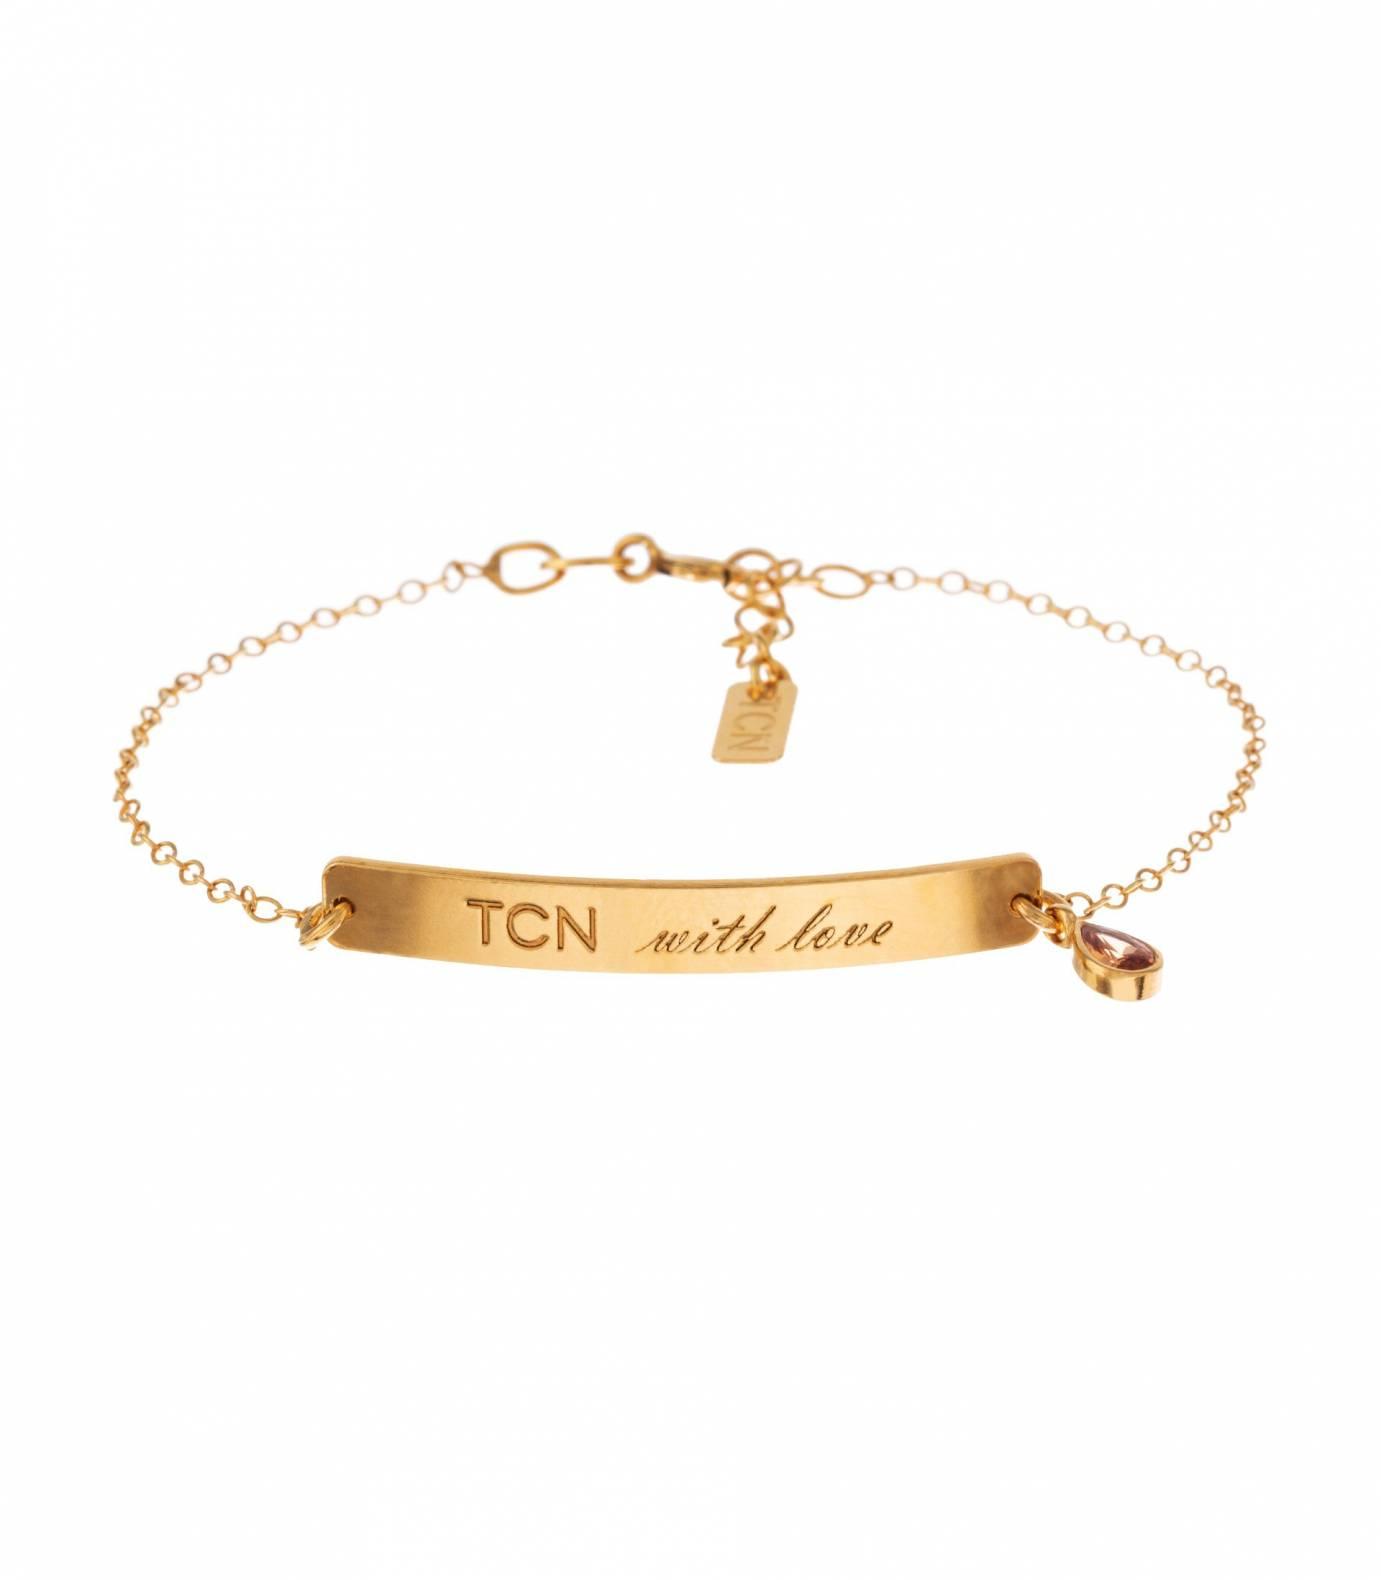 TCN with love gold bracelet